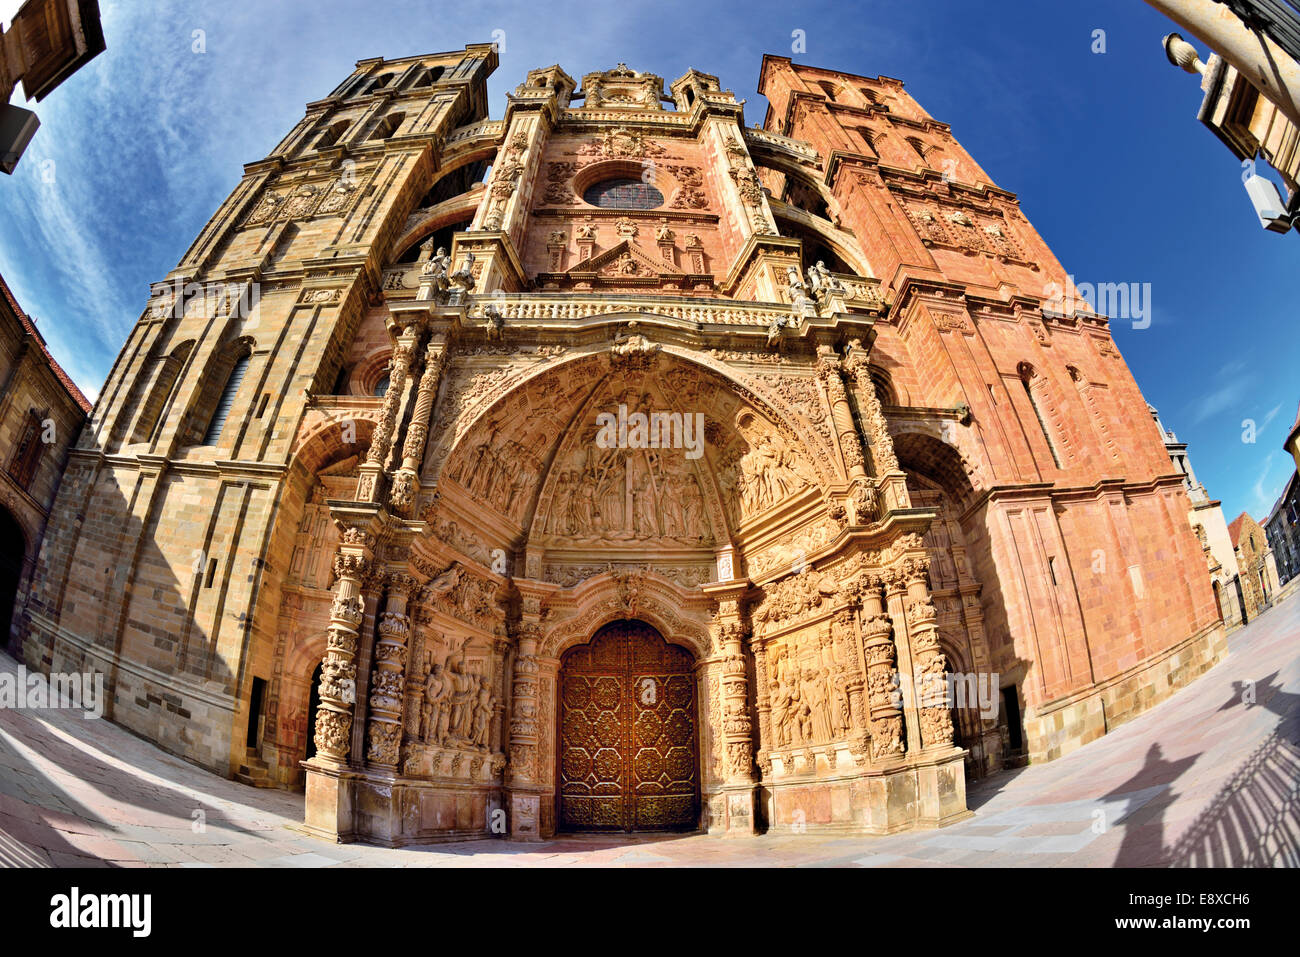 Spain, Castilla-Leon: Fisheye view of the Cathedral Santa Maria of Astorga - Stock Image